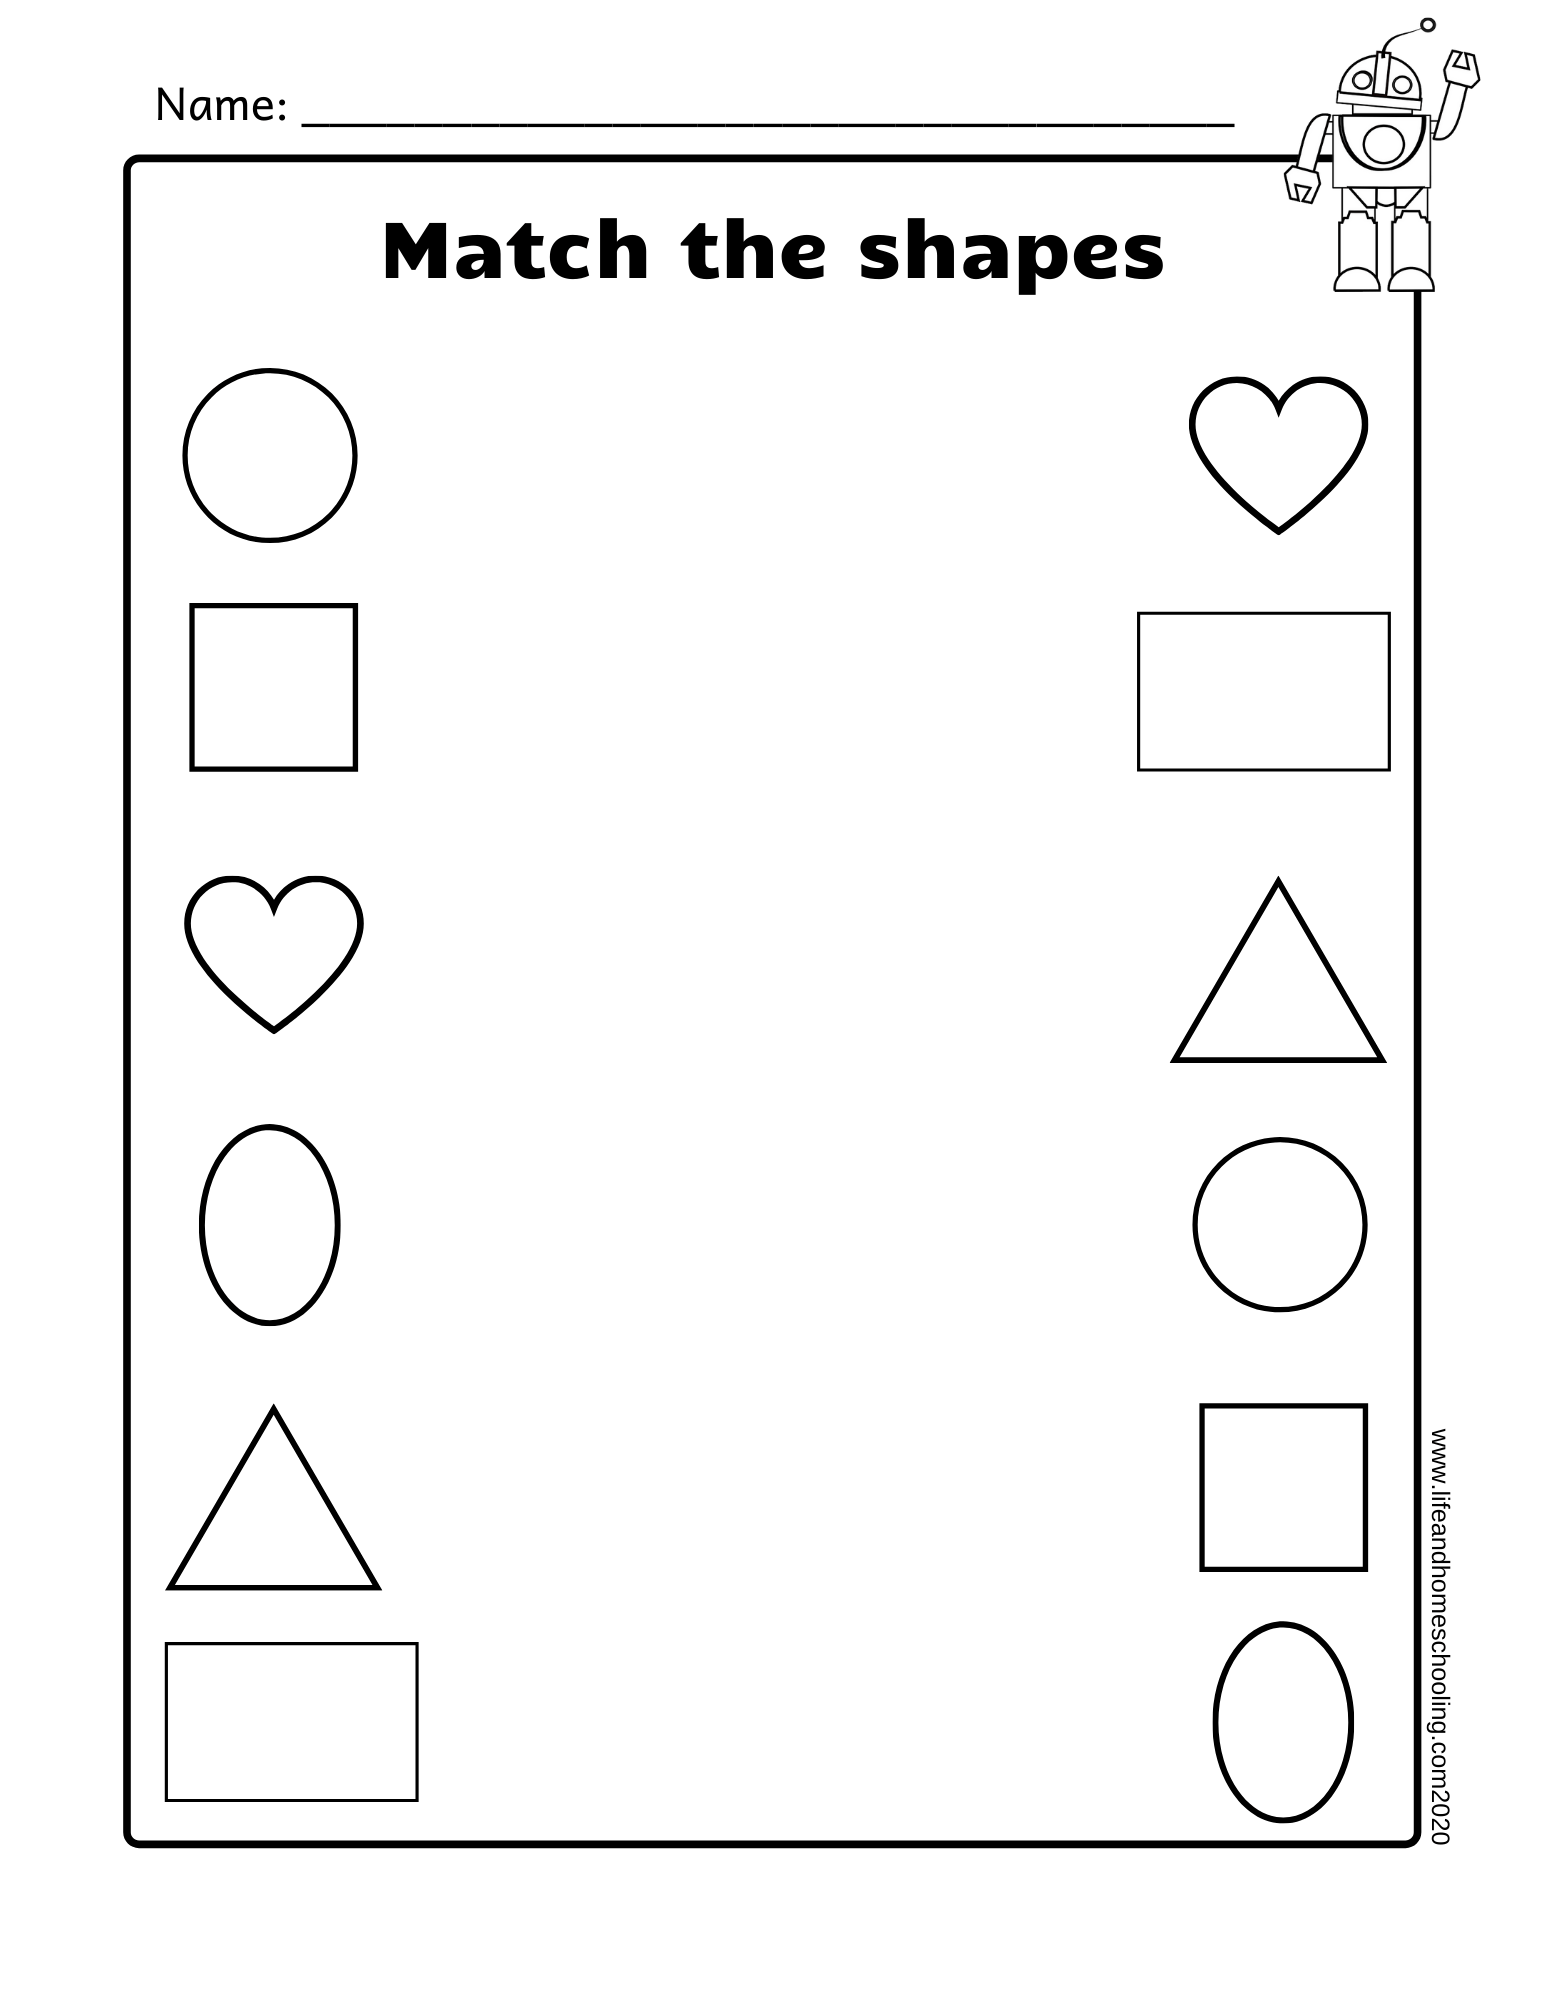 Free Shapes Amp Patterns Printable Worksheets